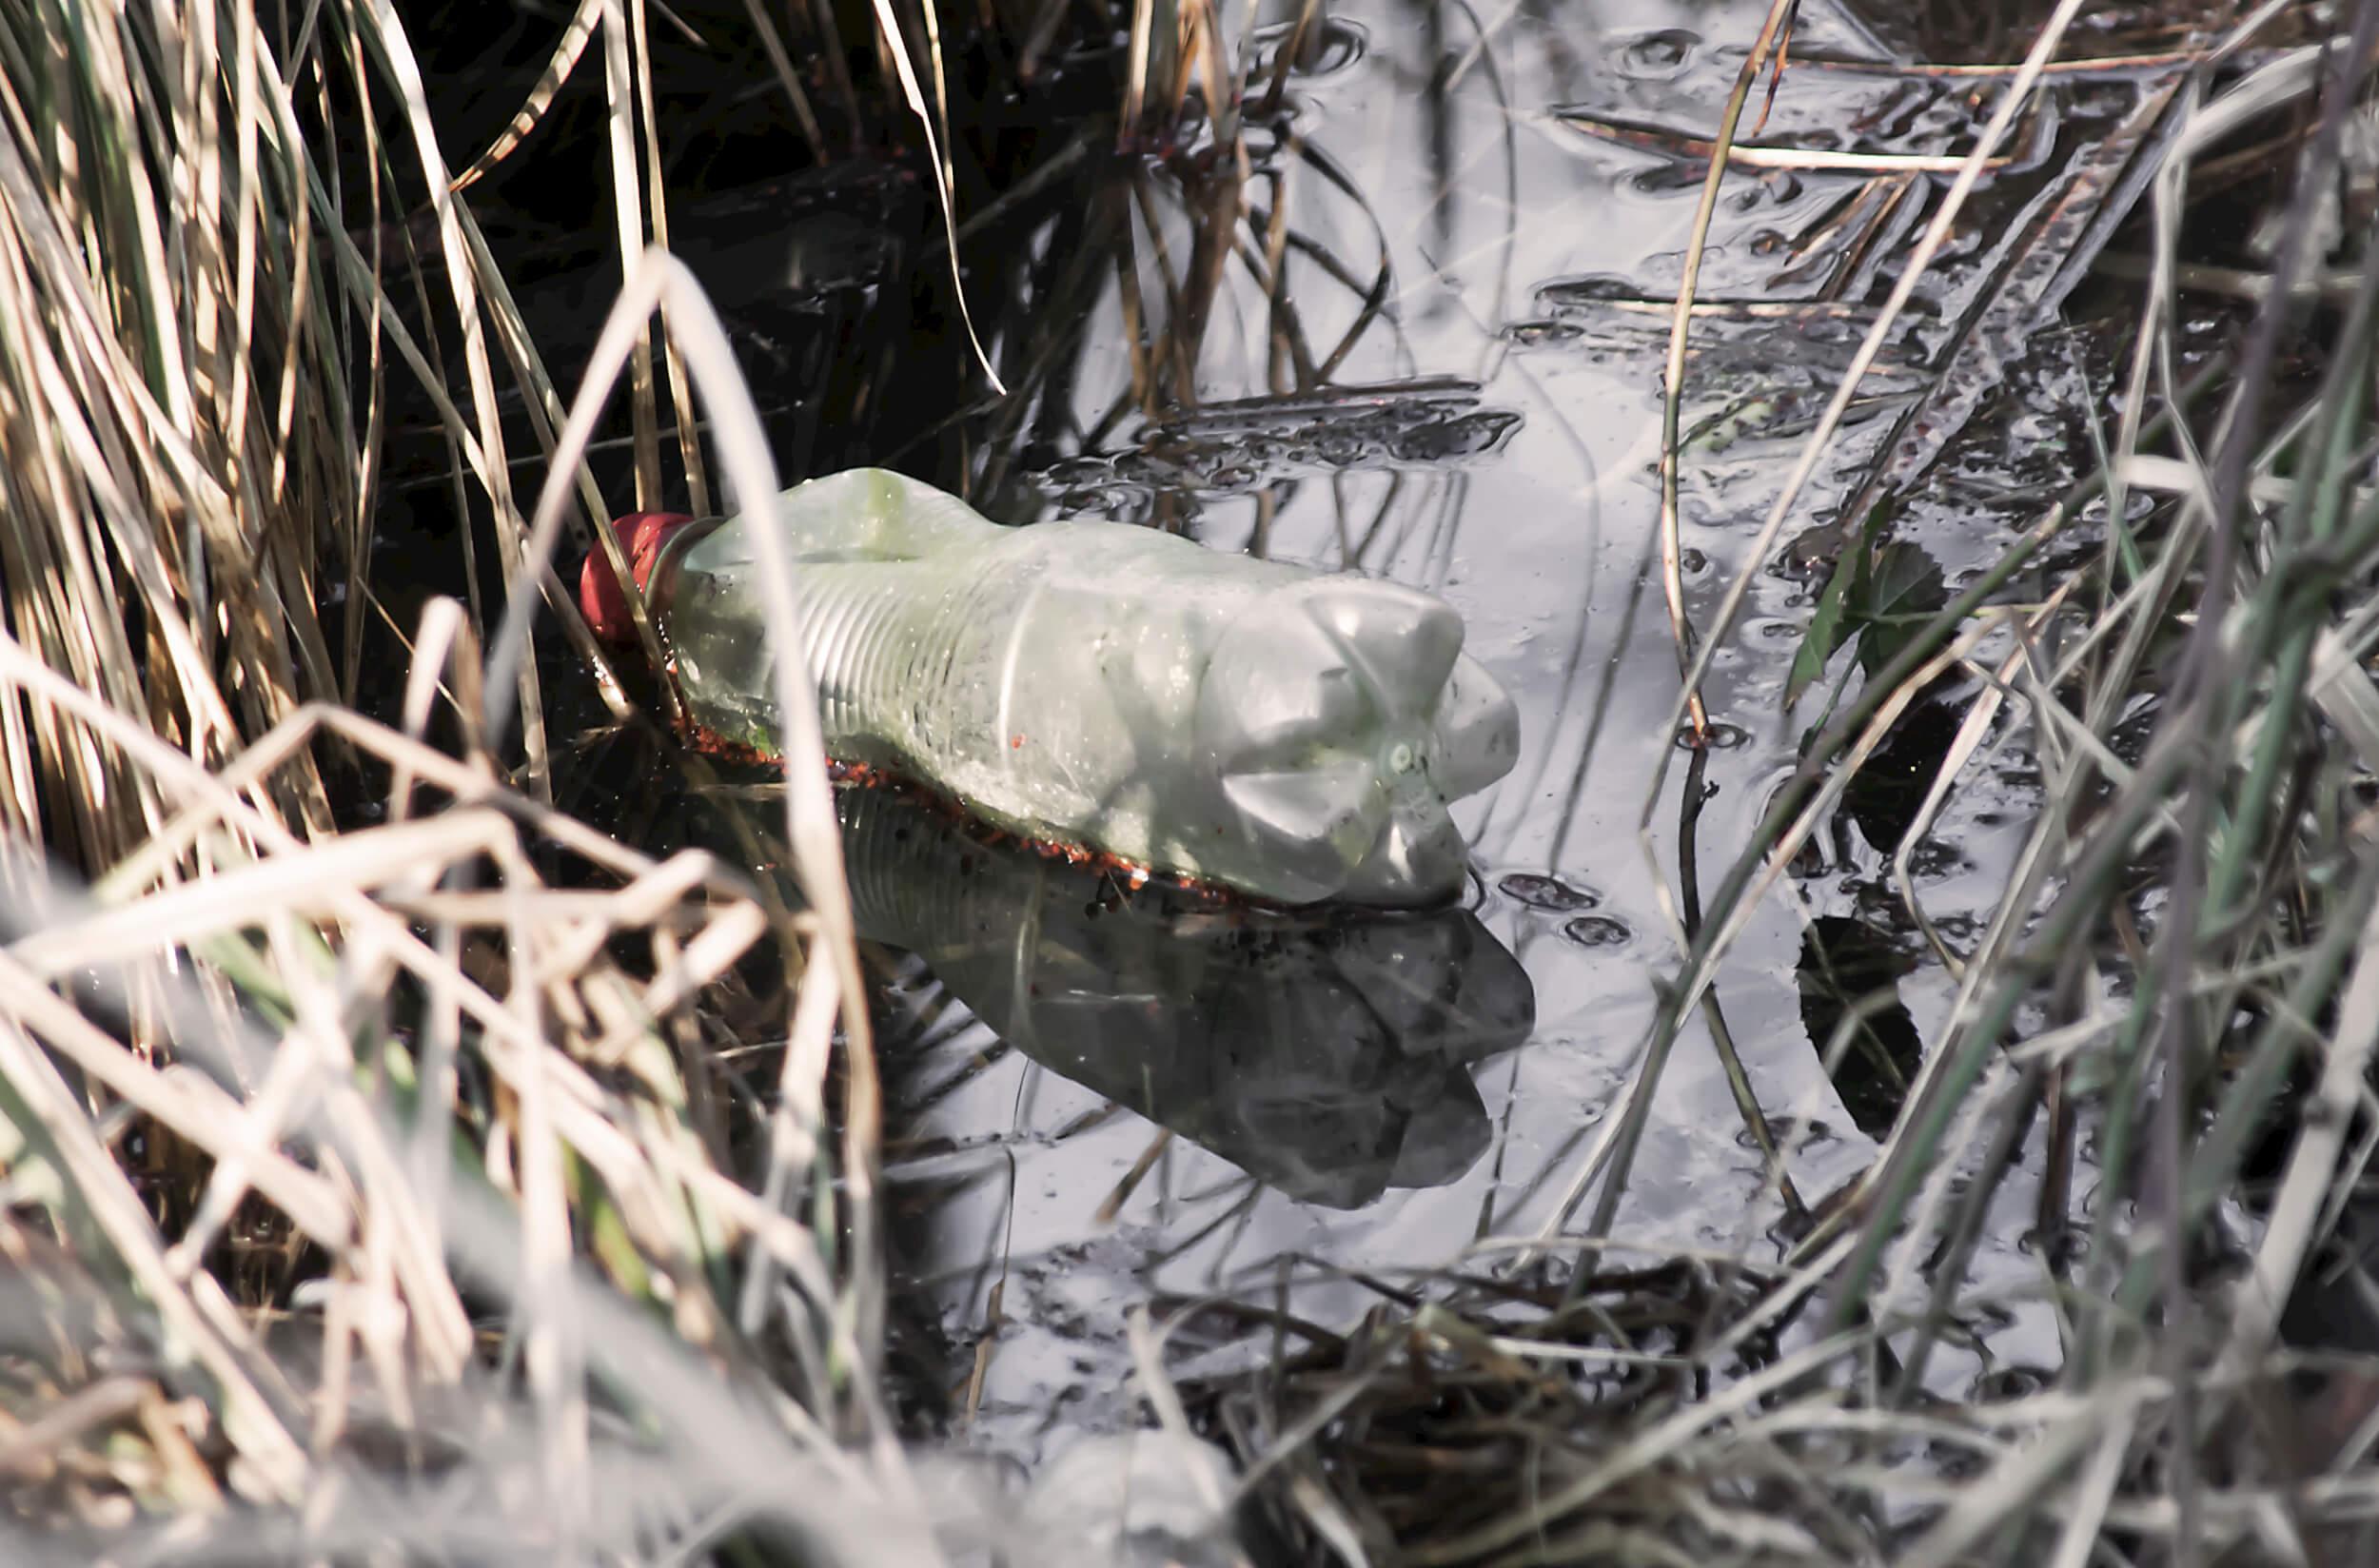 Plasteflasche Umweltschutz (c) Torsten Rempt / pixelio.de